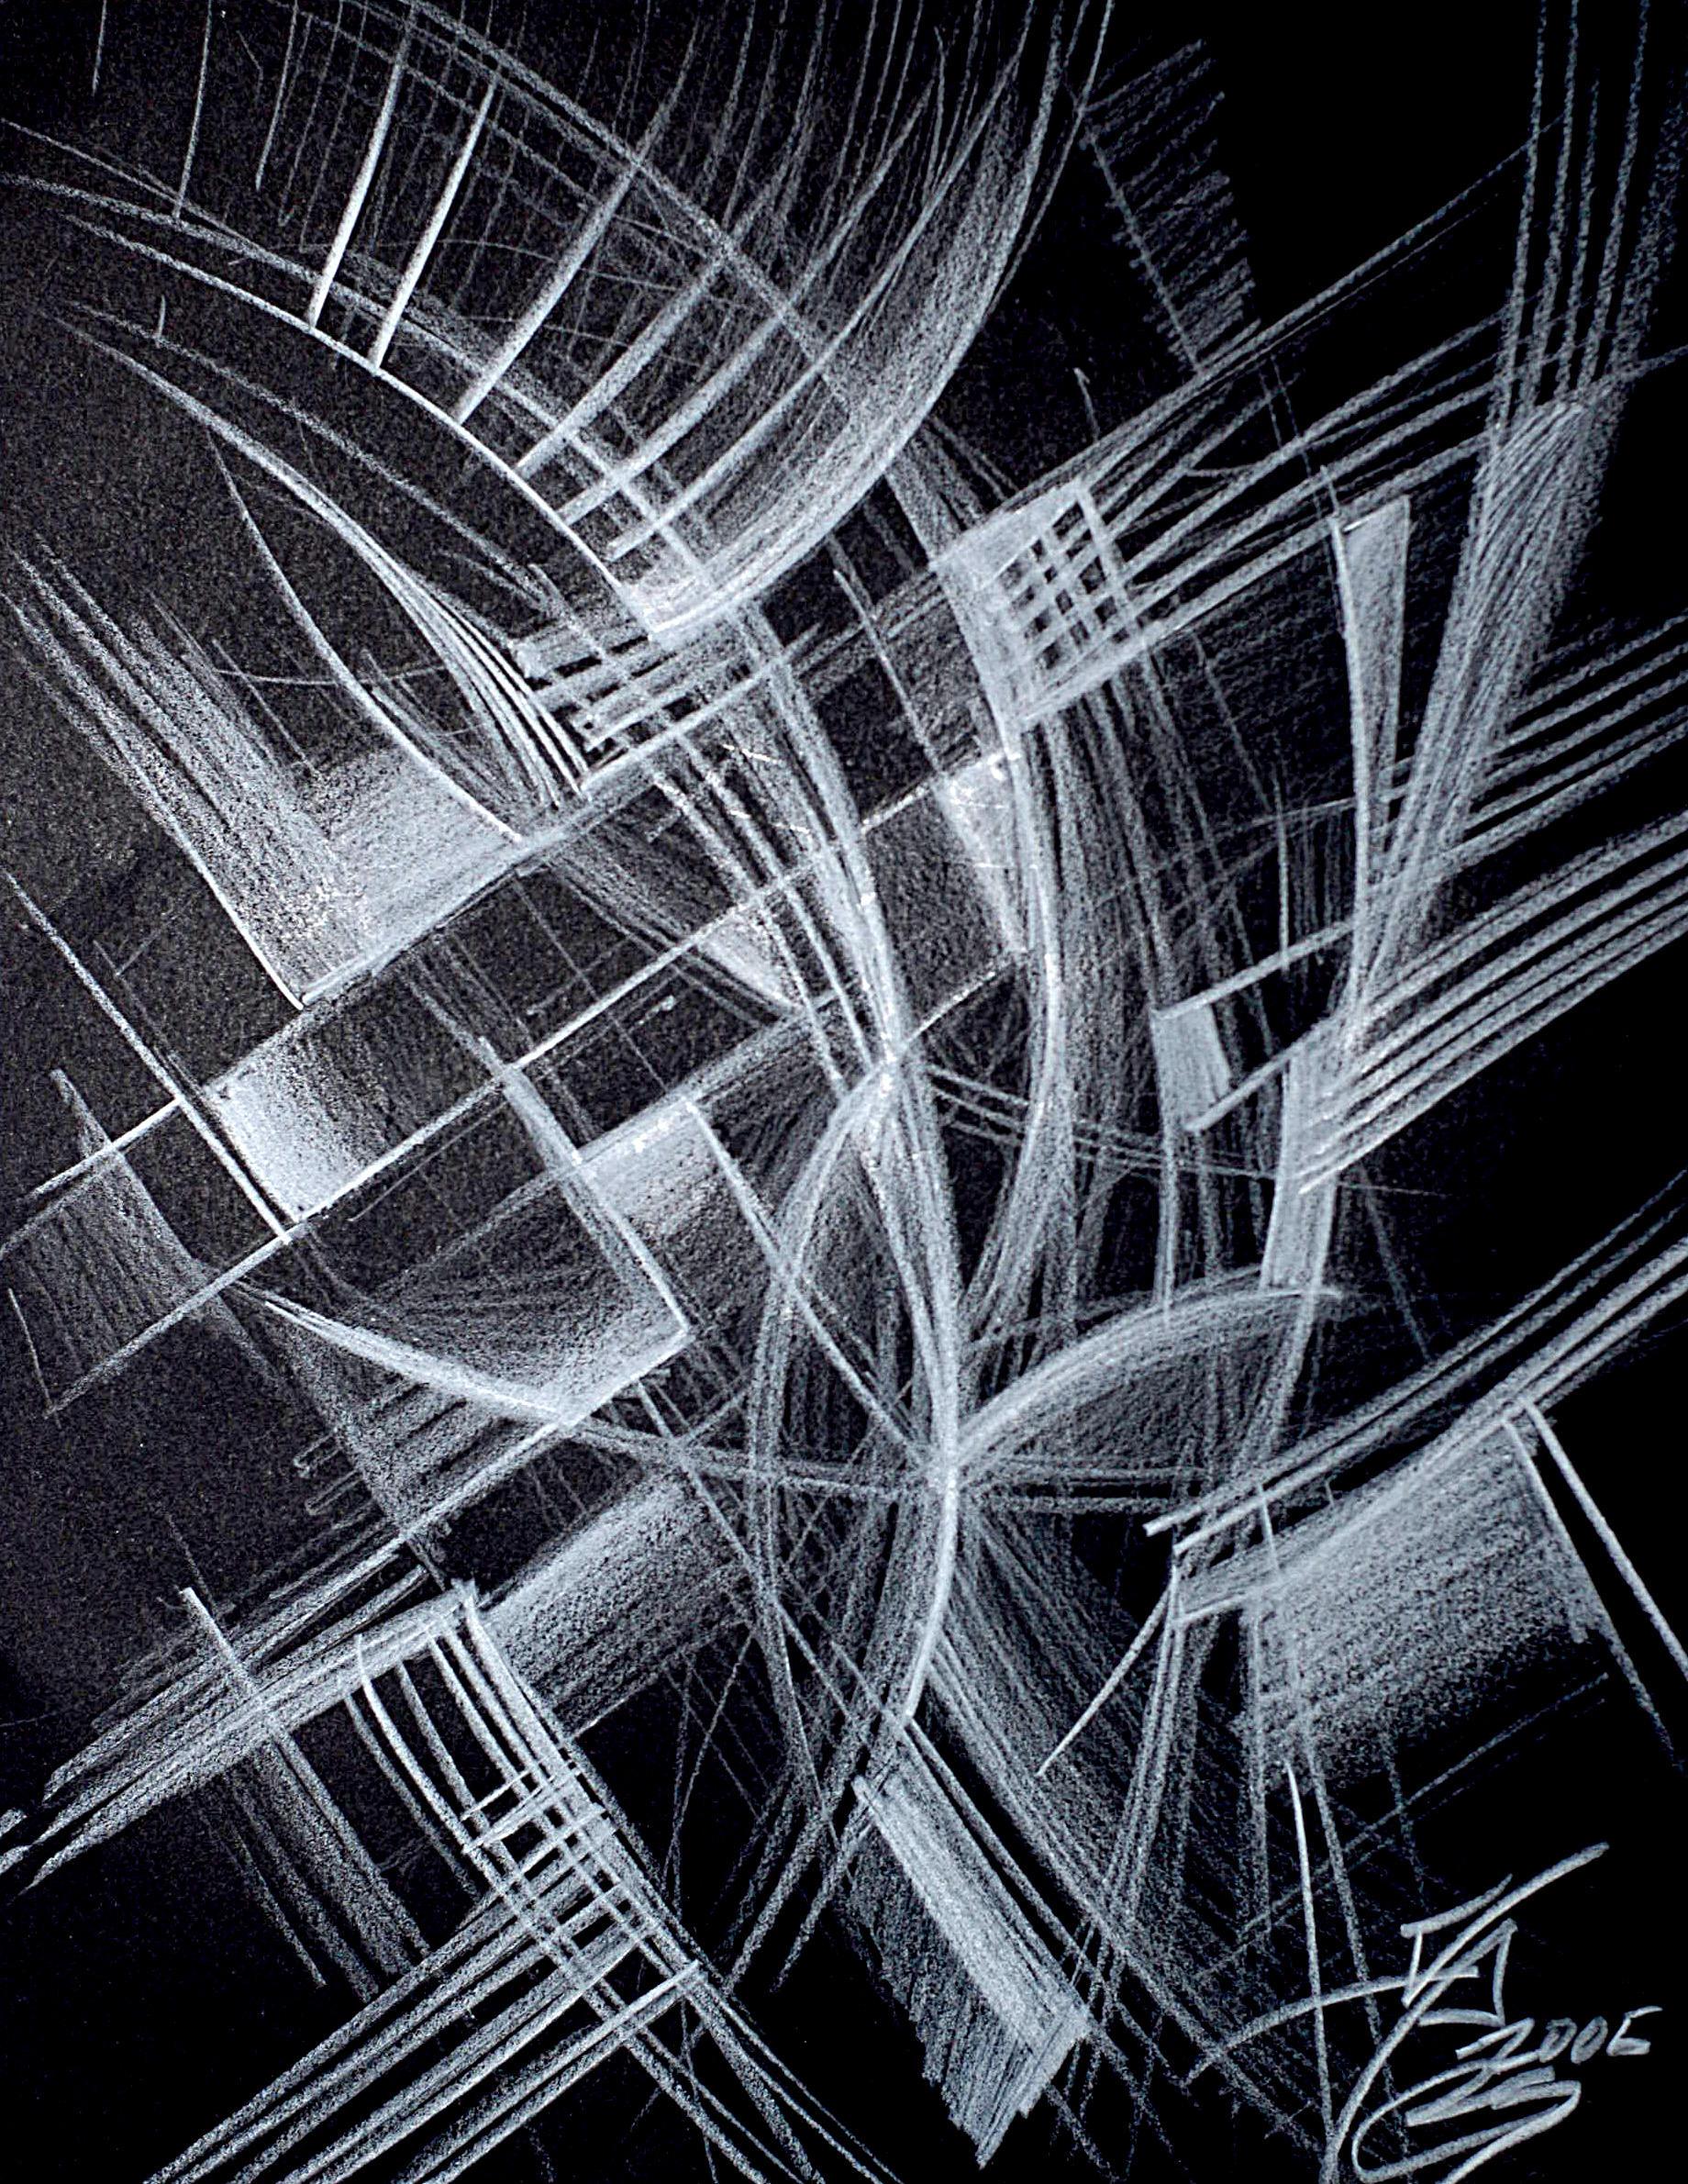 Abstract for Karen by CristoILDiablo